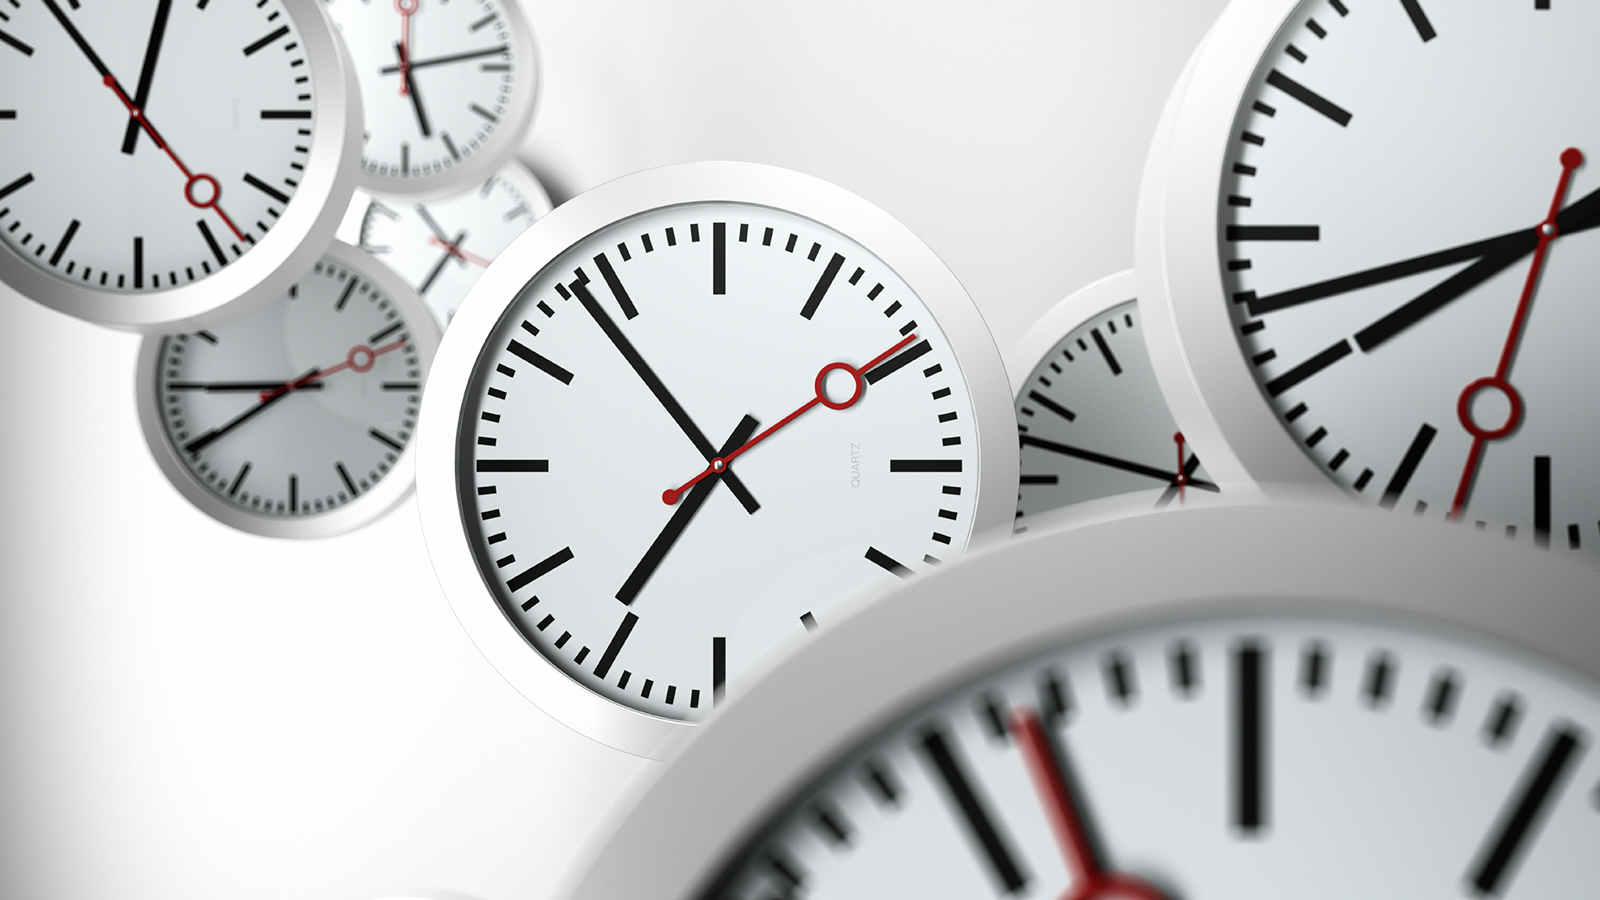 Utc coordinated universal time definition